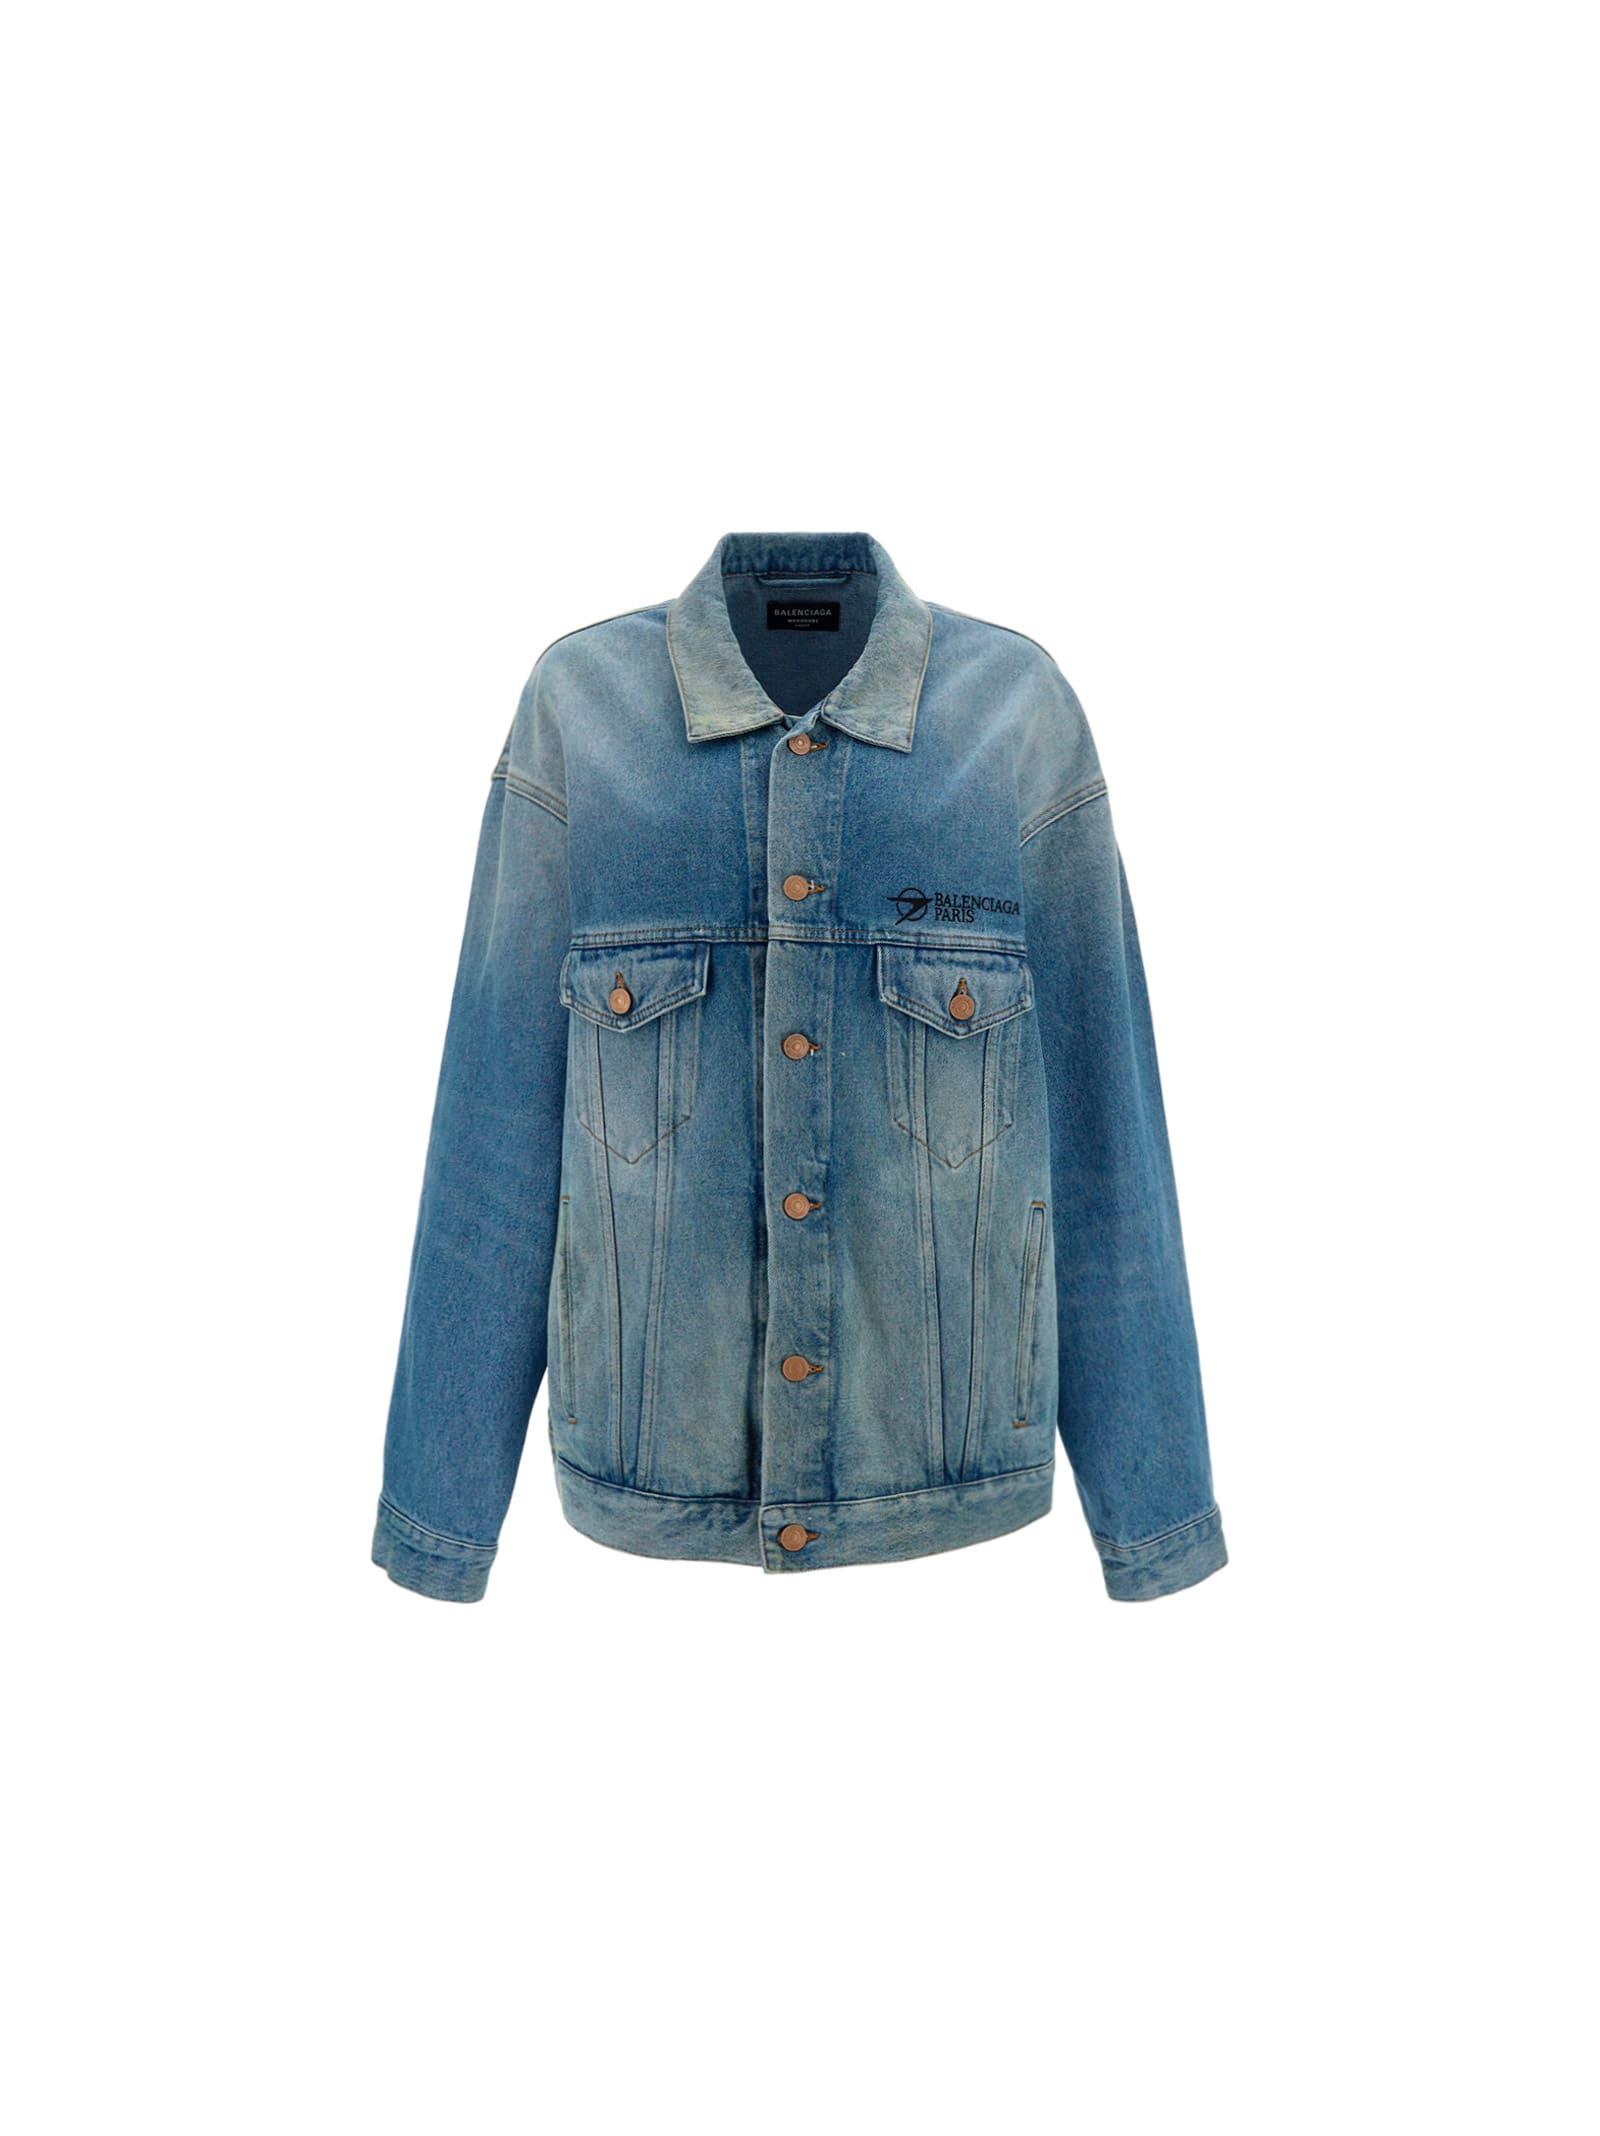 Balenciaga Jackets JACKET